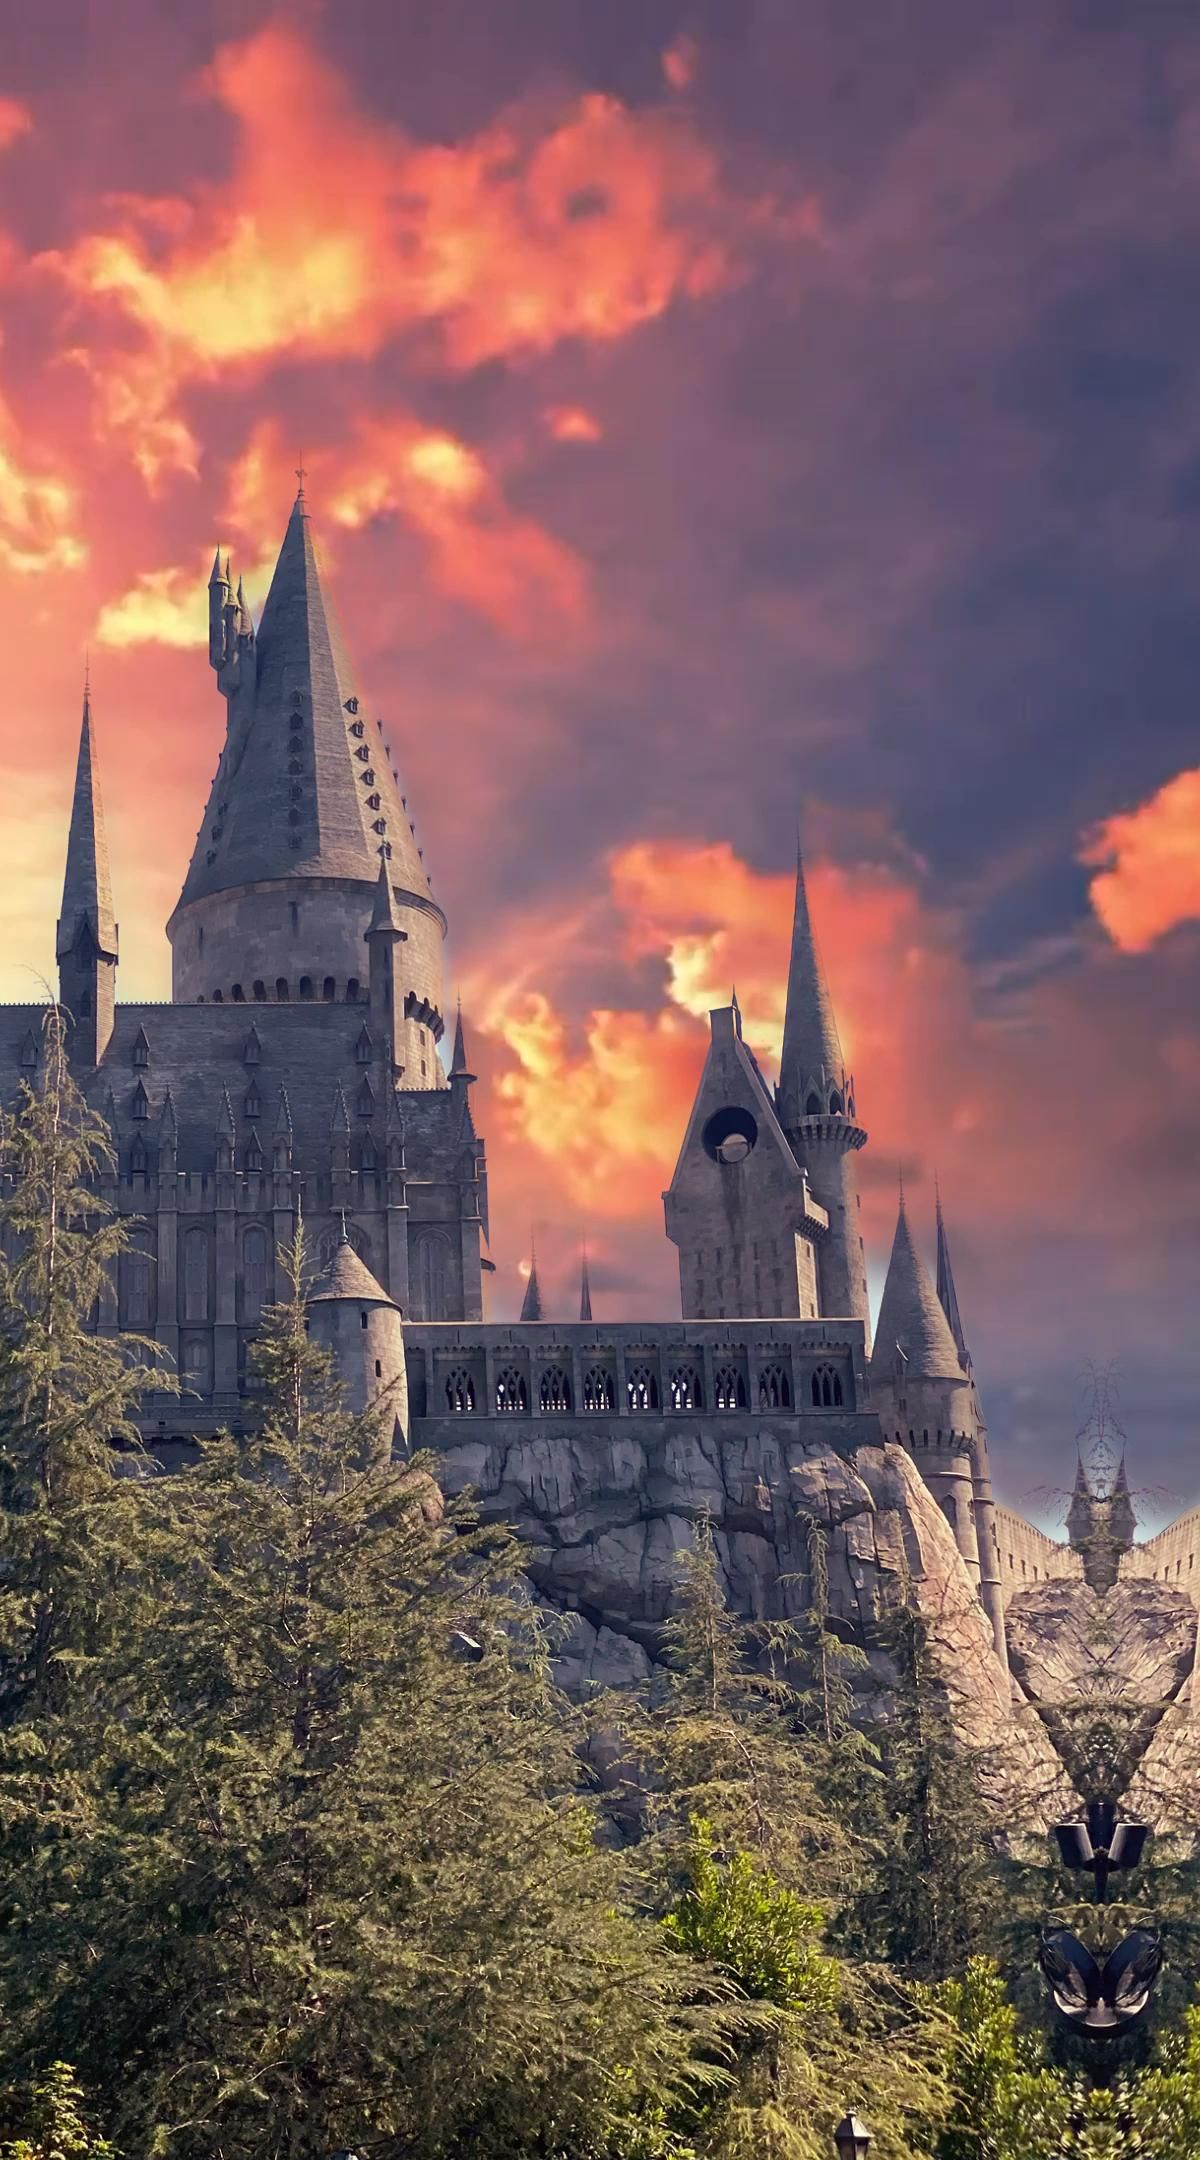 Hogwarts At The Wizarding World